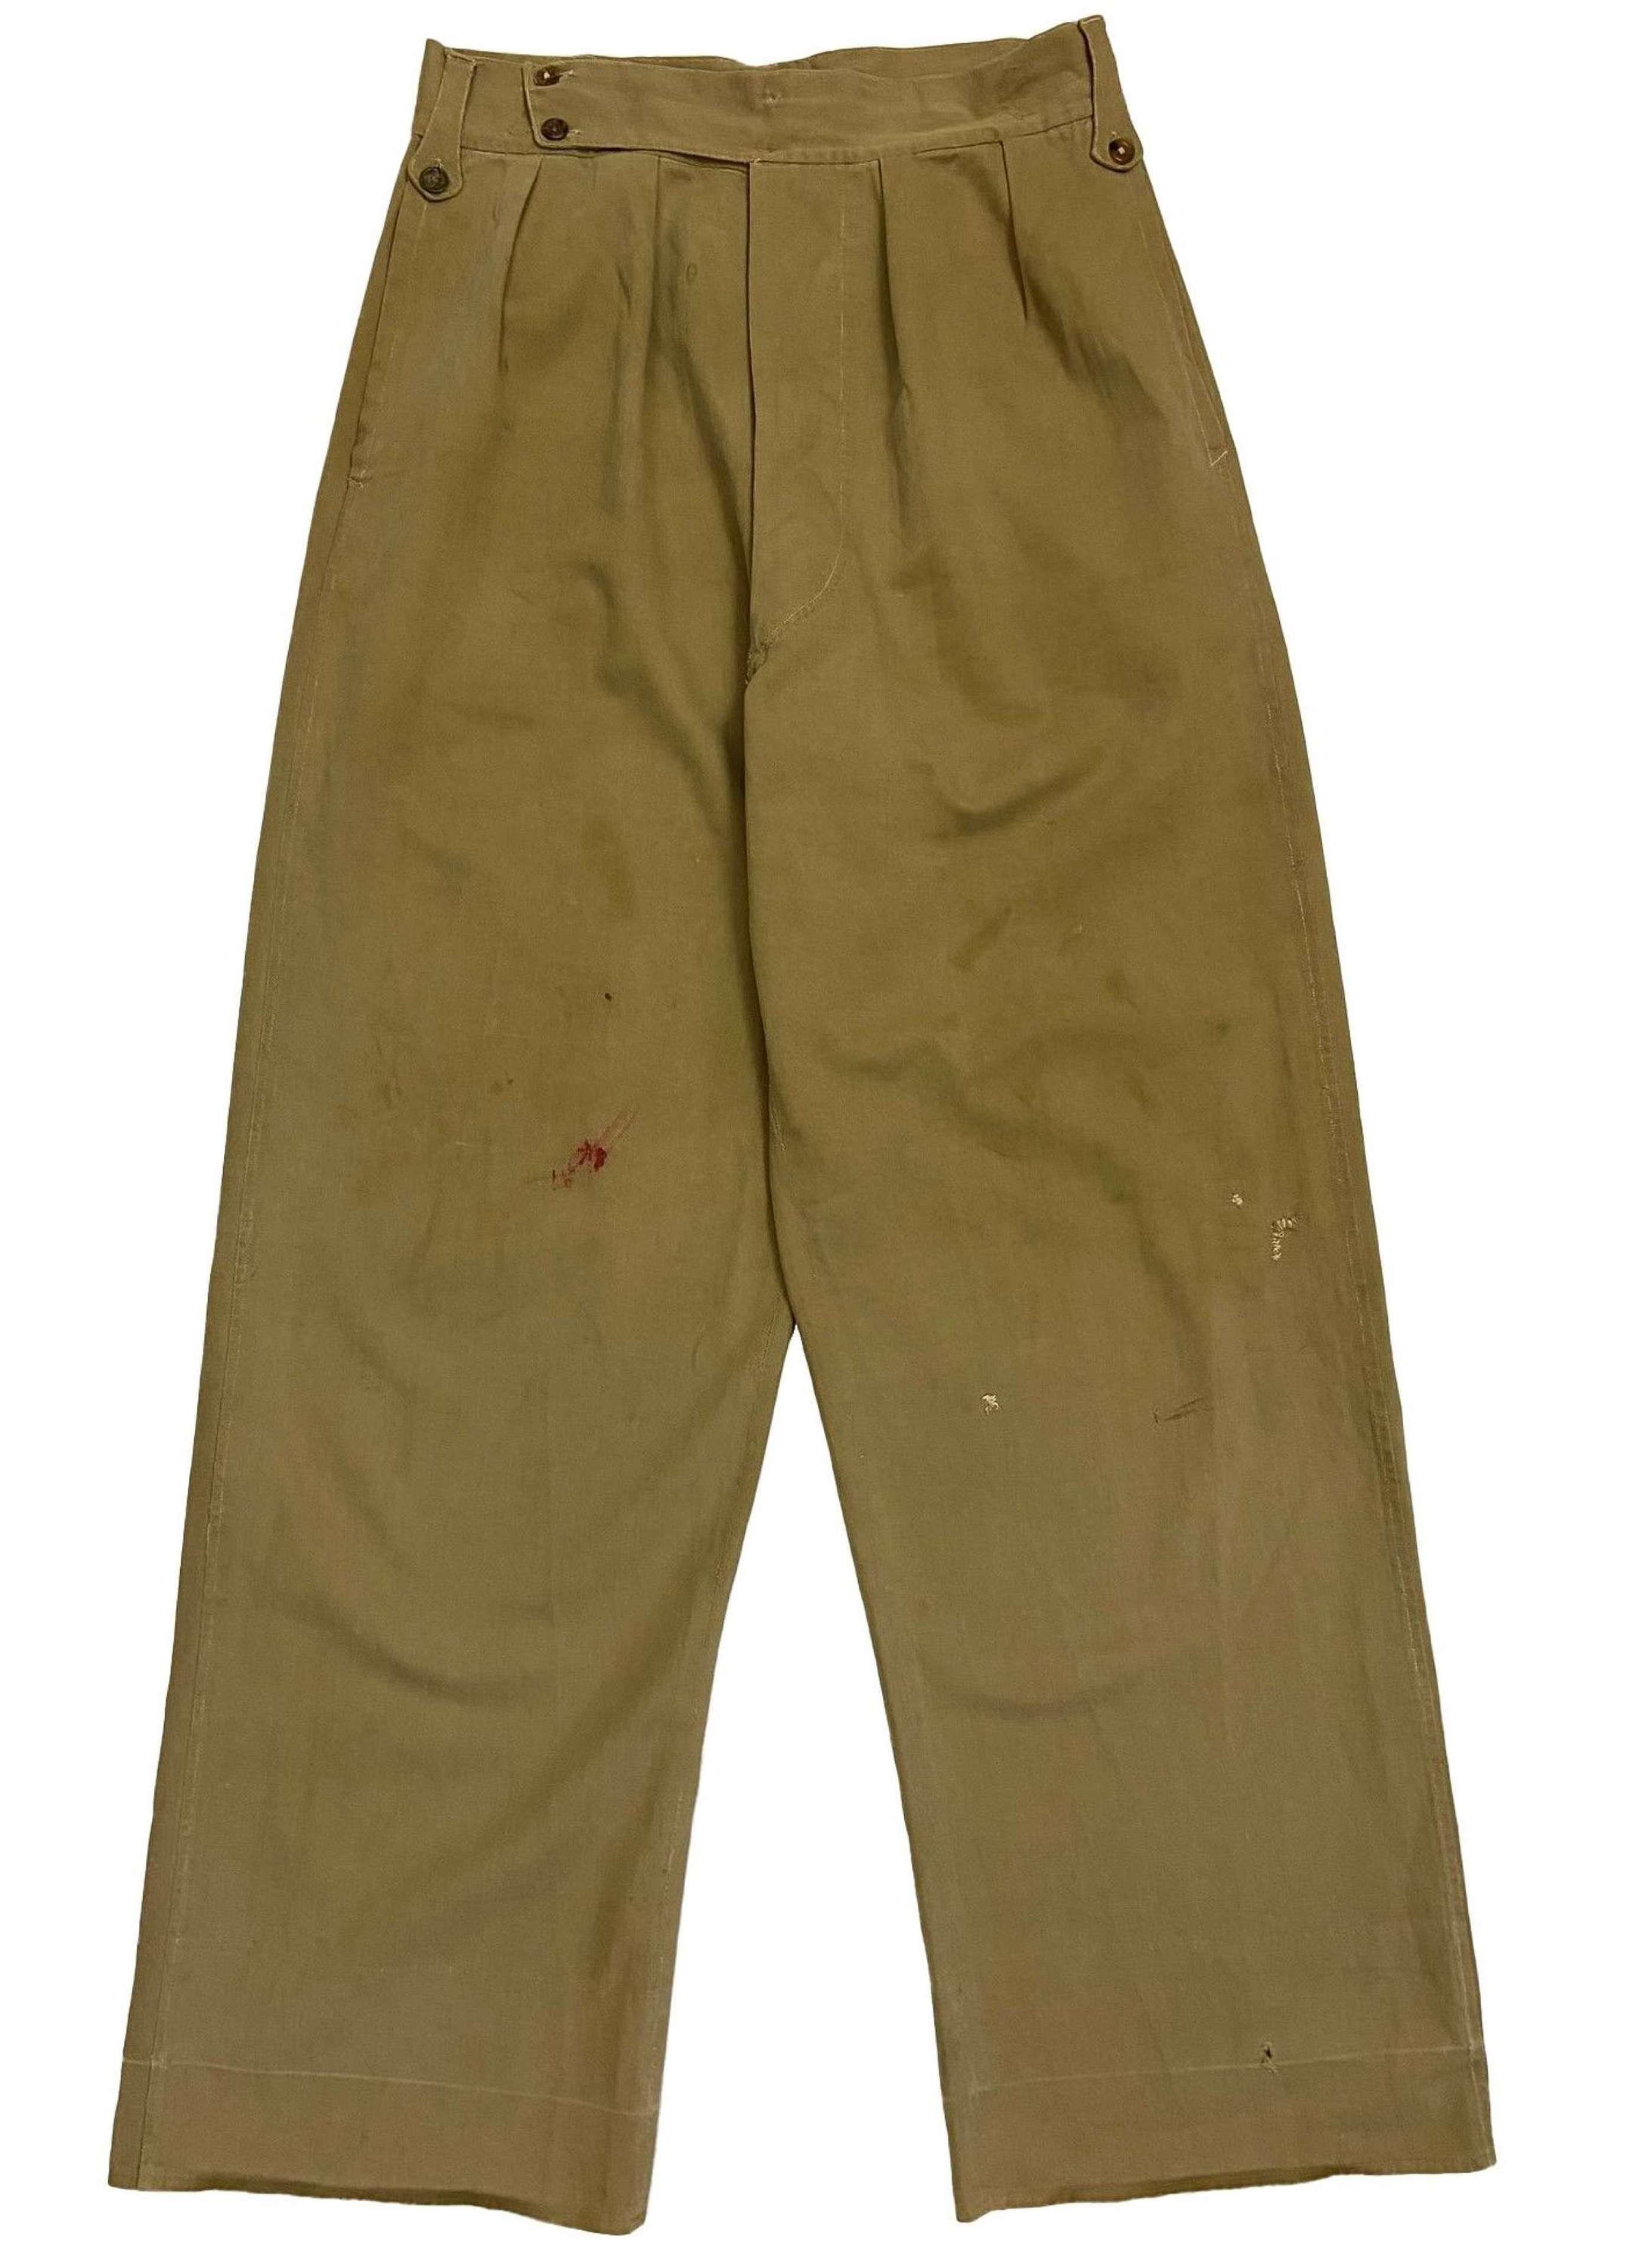 Original WW2 Indian Made British Army Khaki Drill Trousers